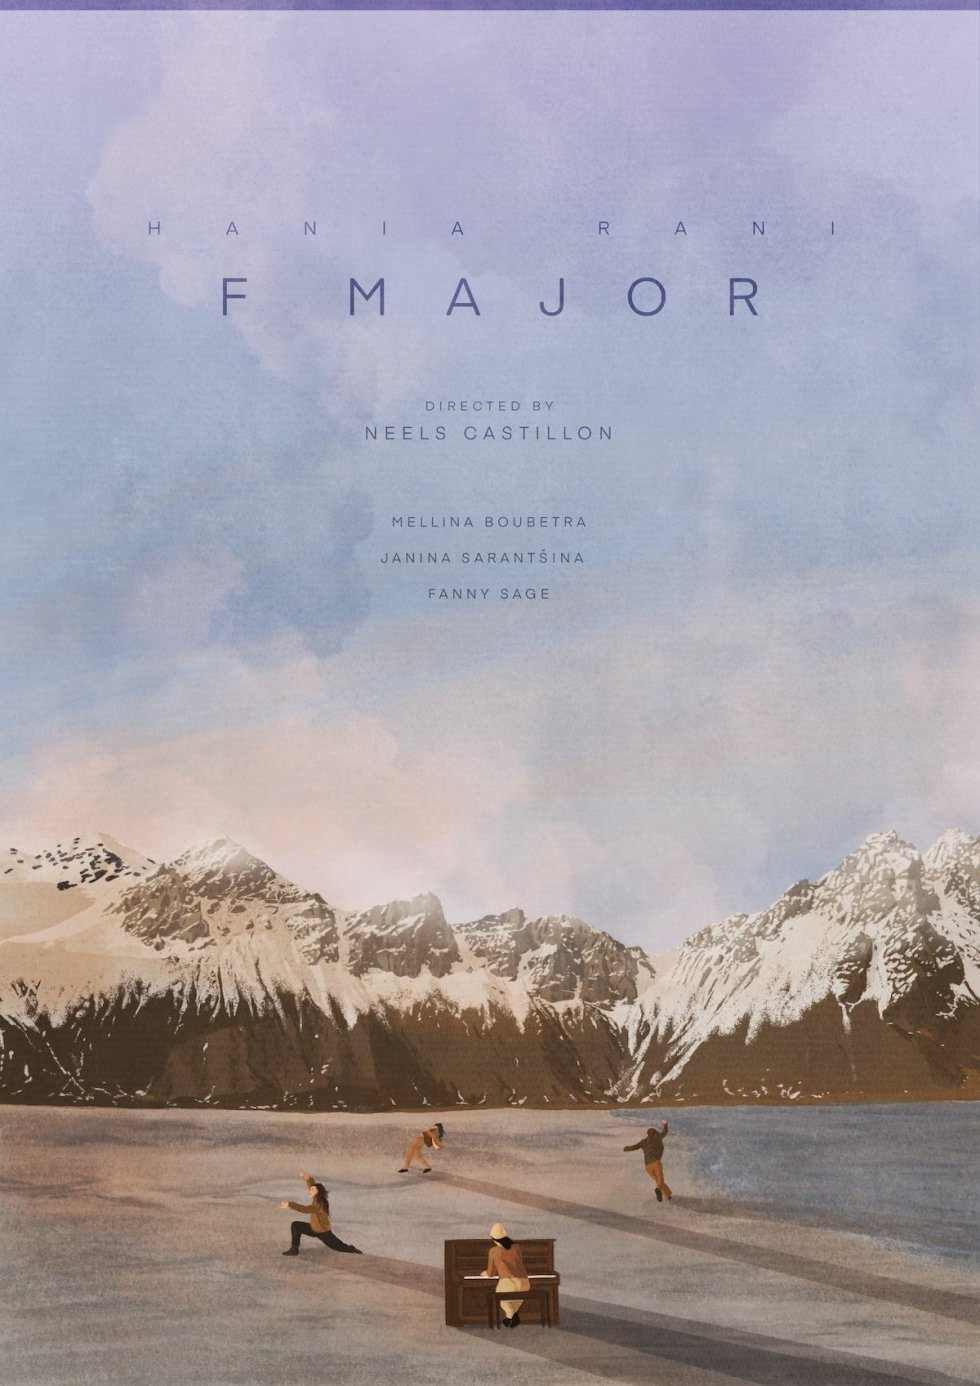 F Major music video poster by Jamie Edler